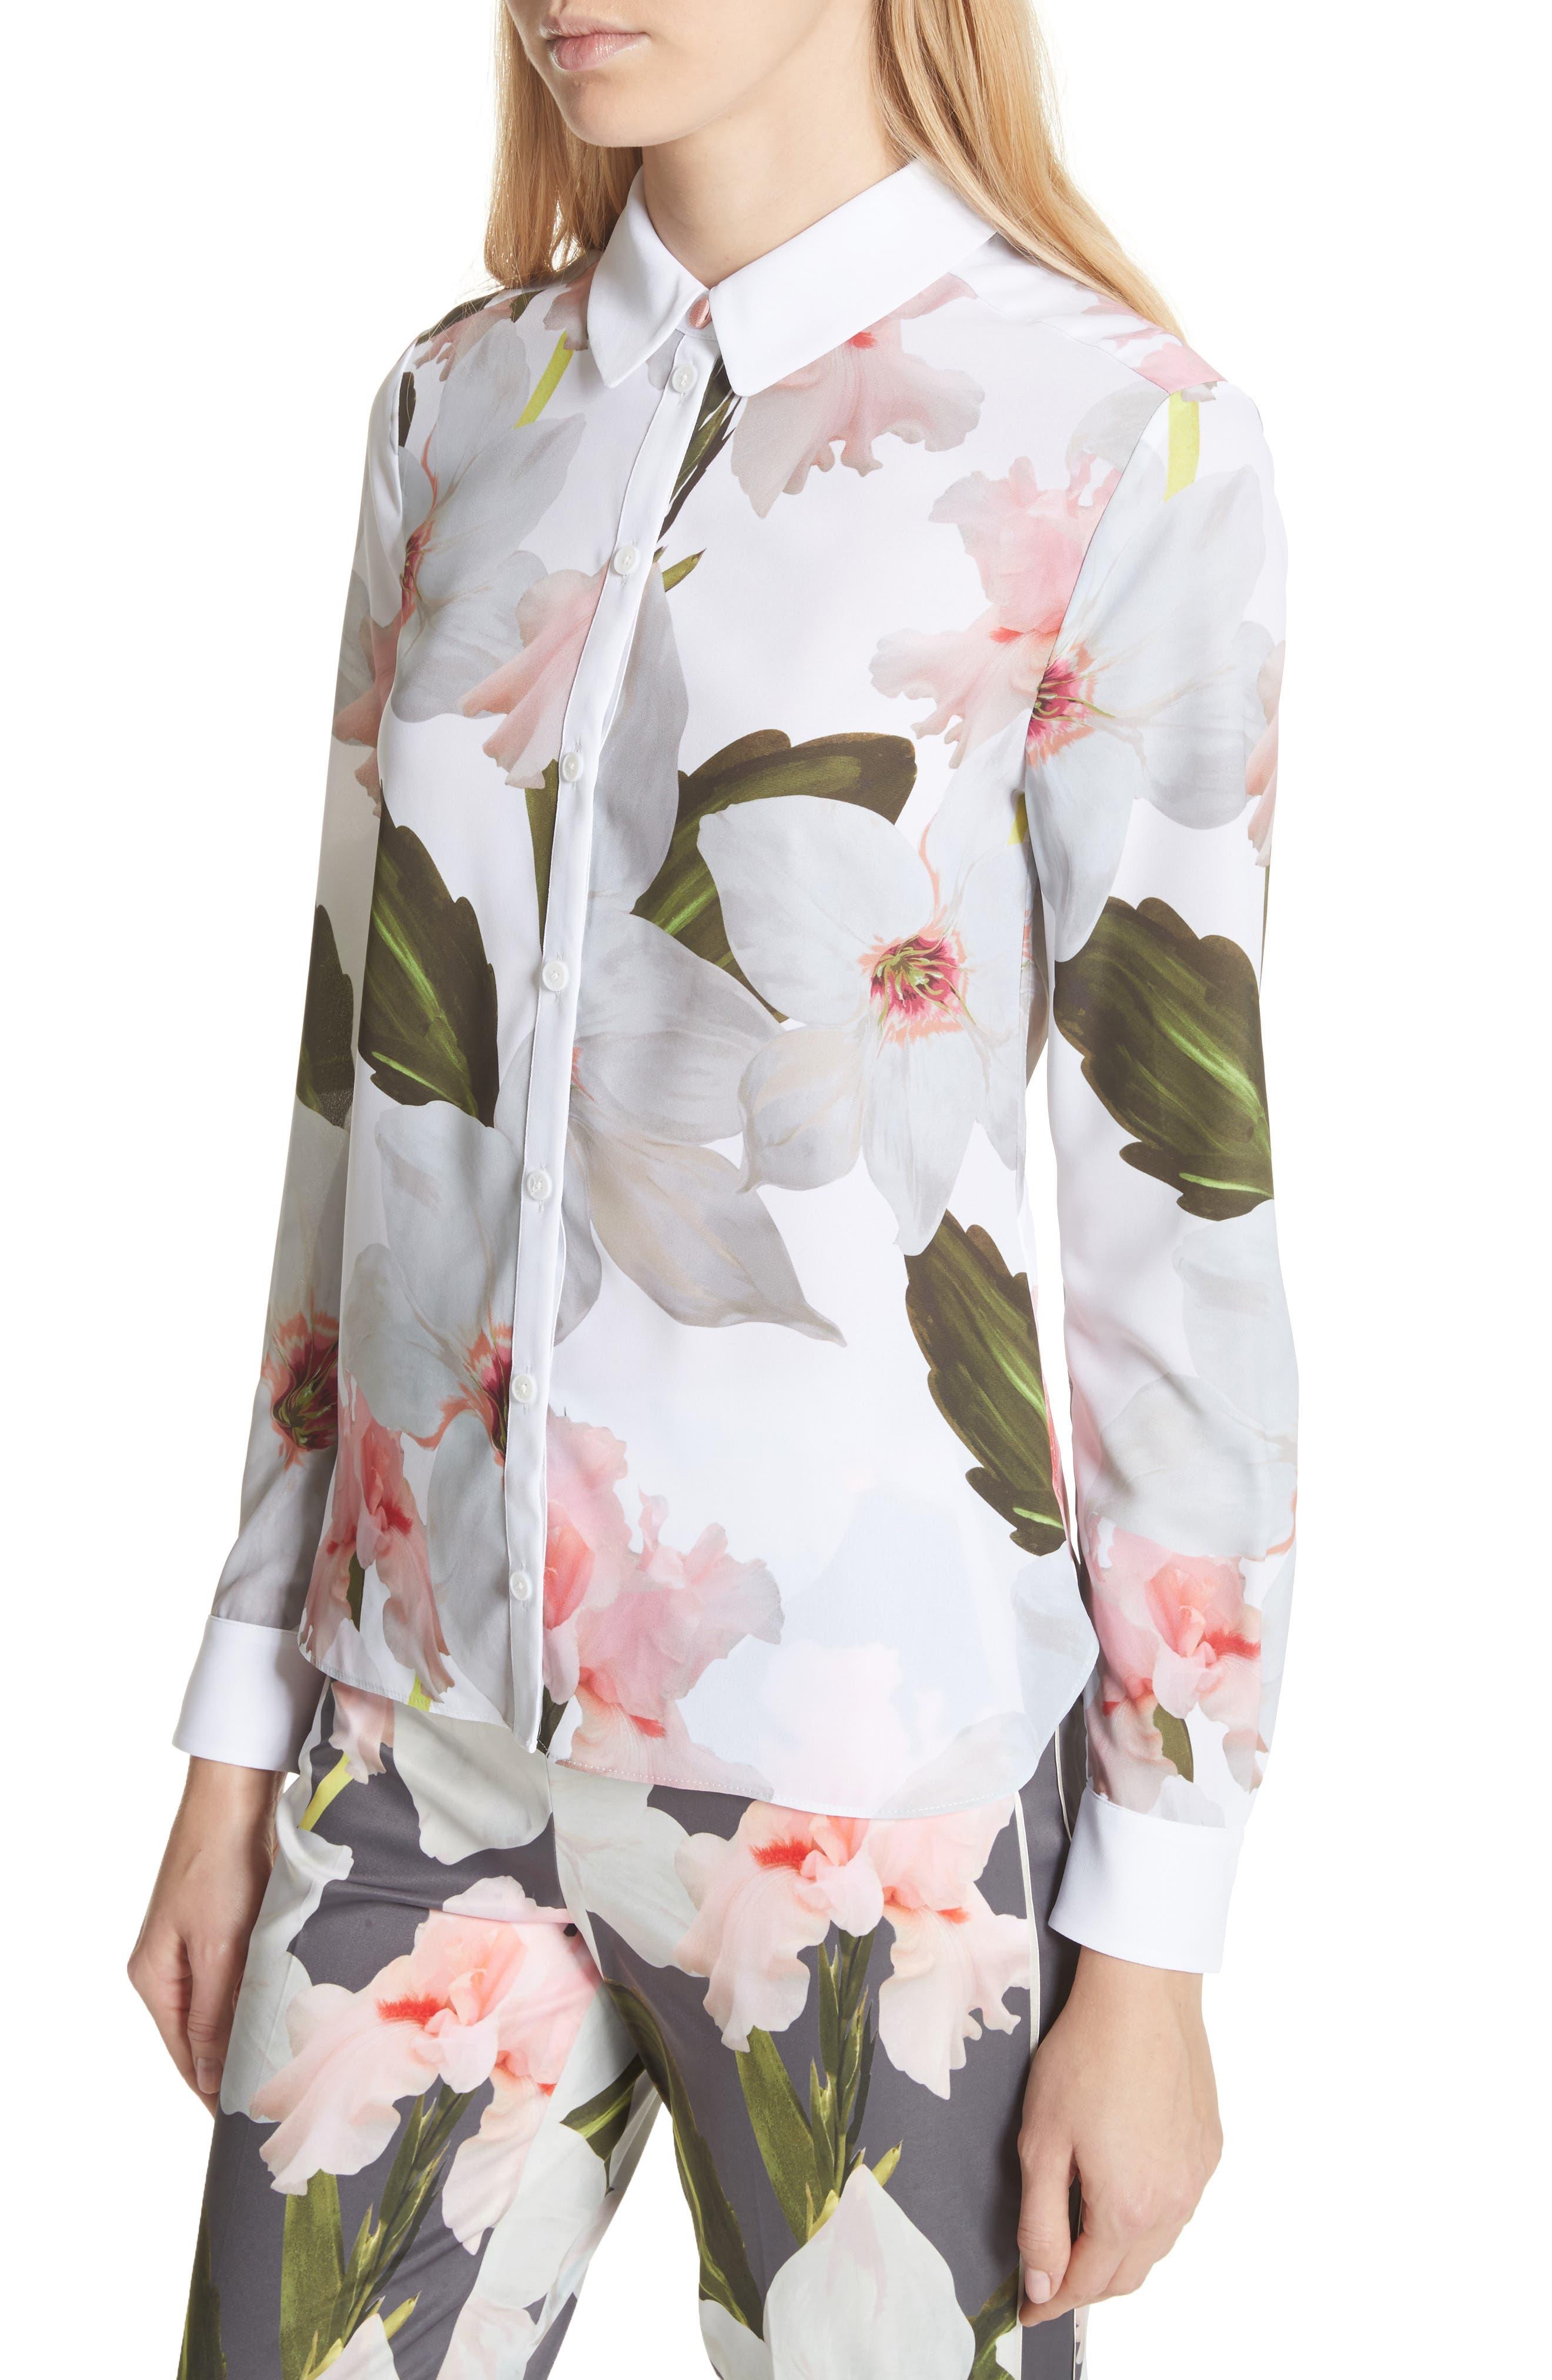 Chatsworth Bloom Shirt,                             Alternate thumbnail 4, color,                             White